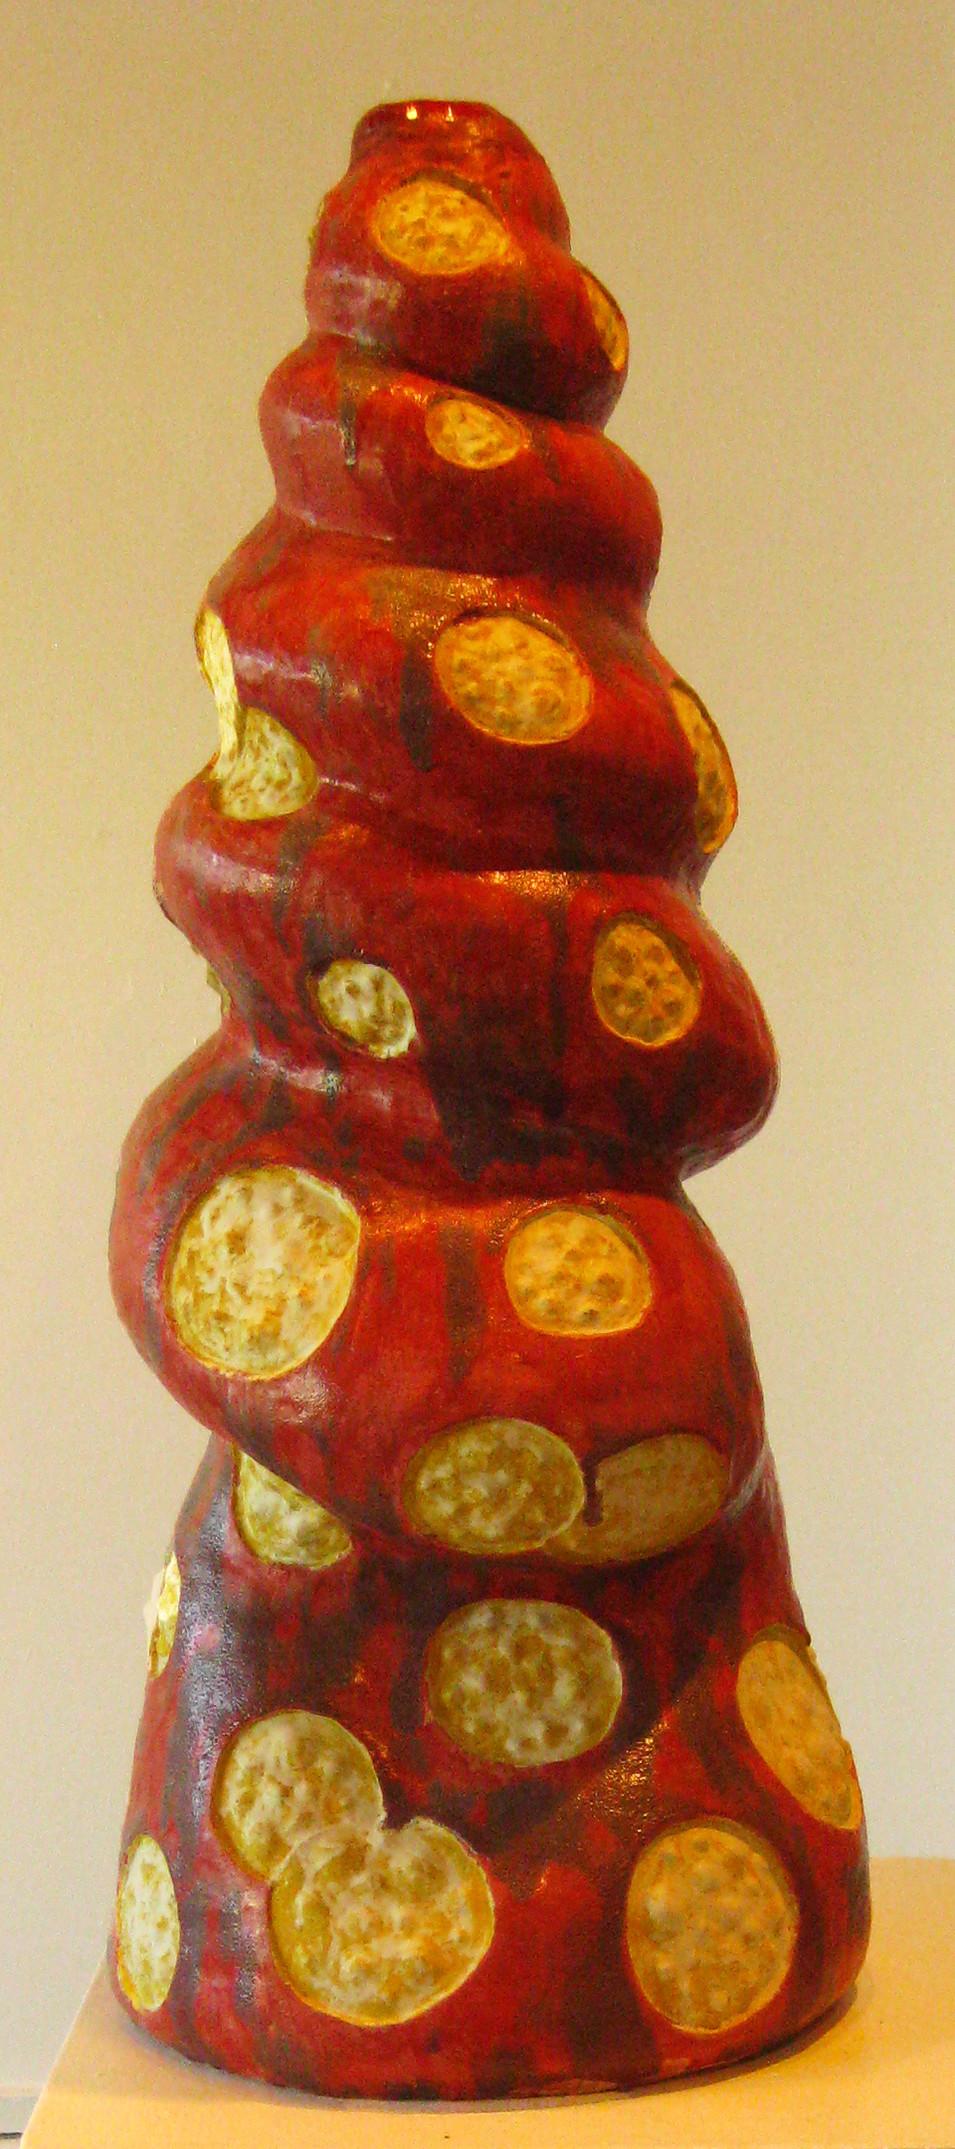 red spiral mushroom